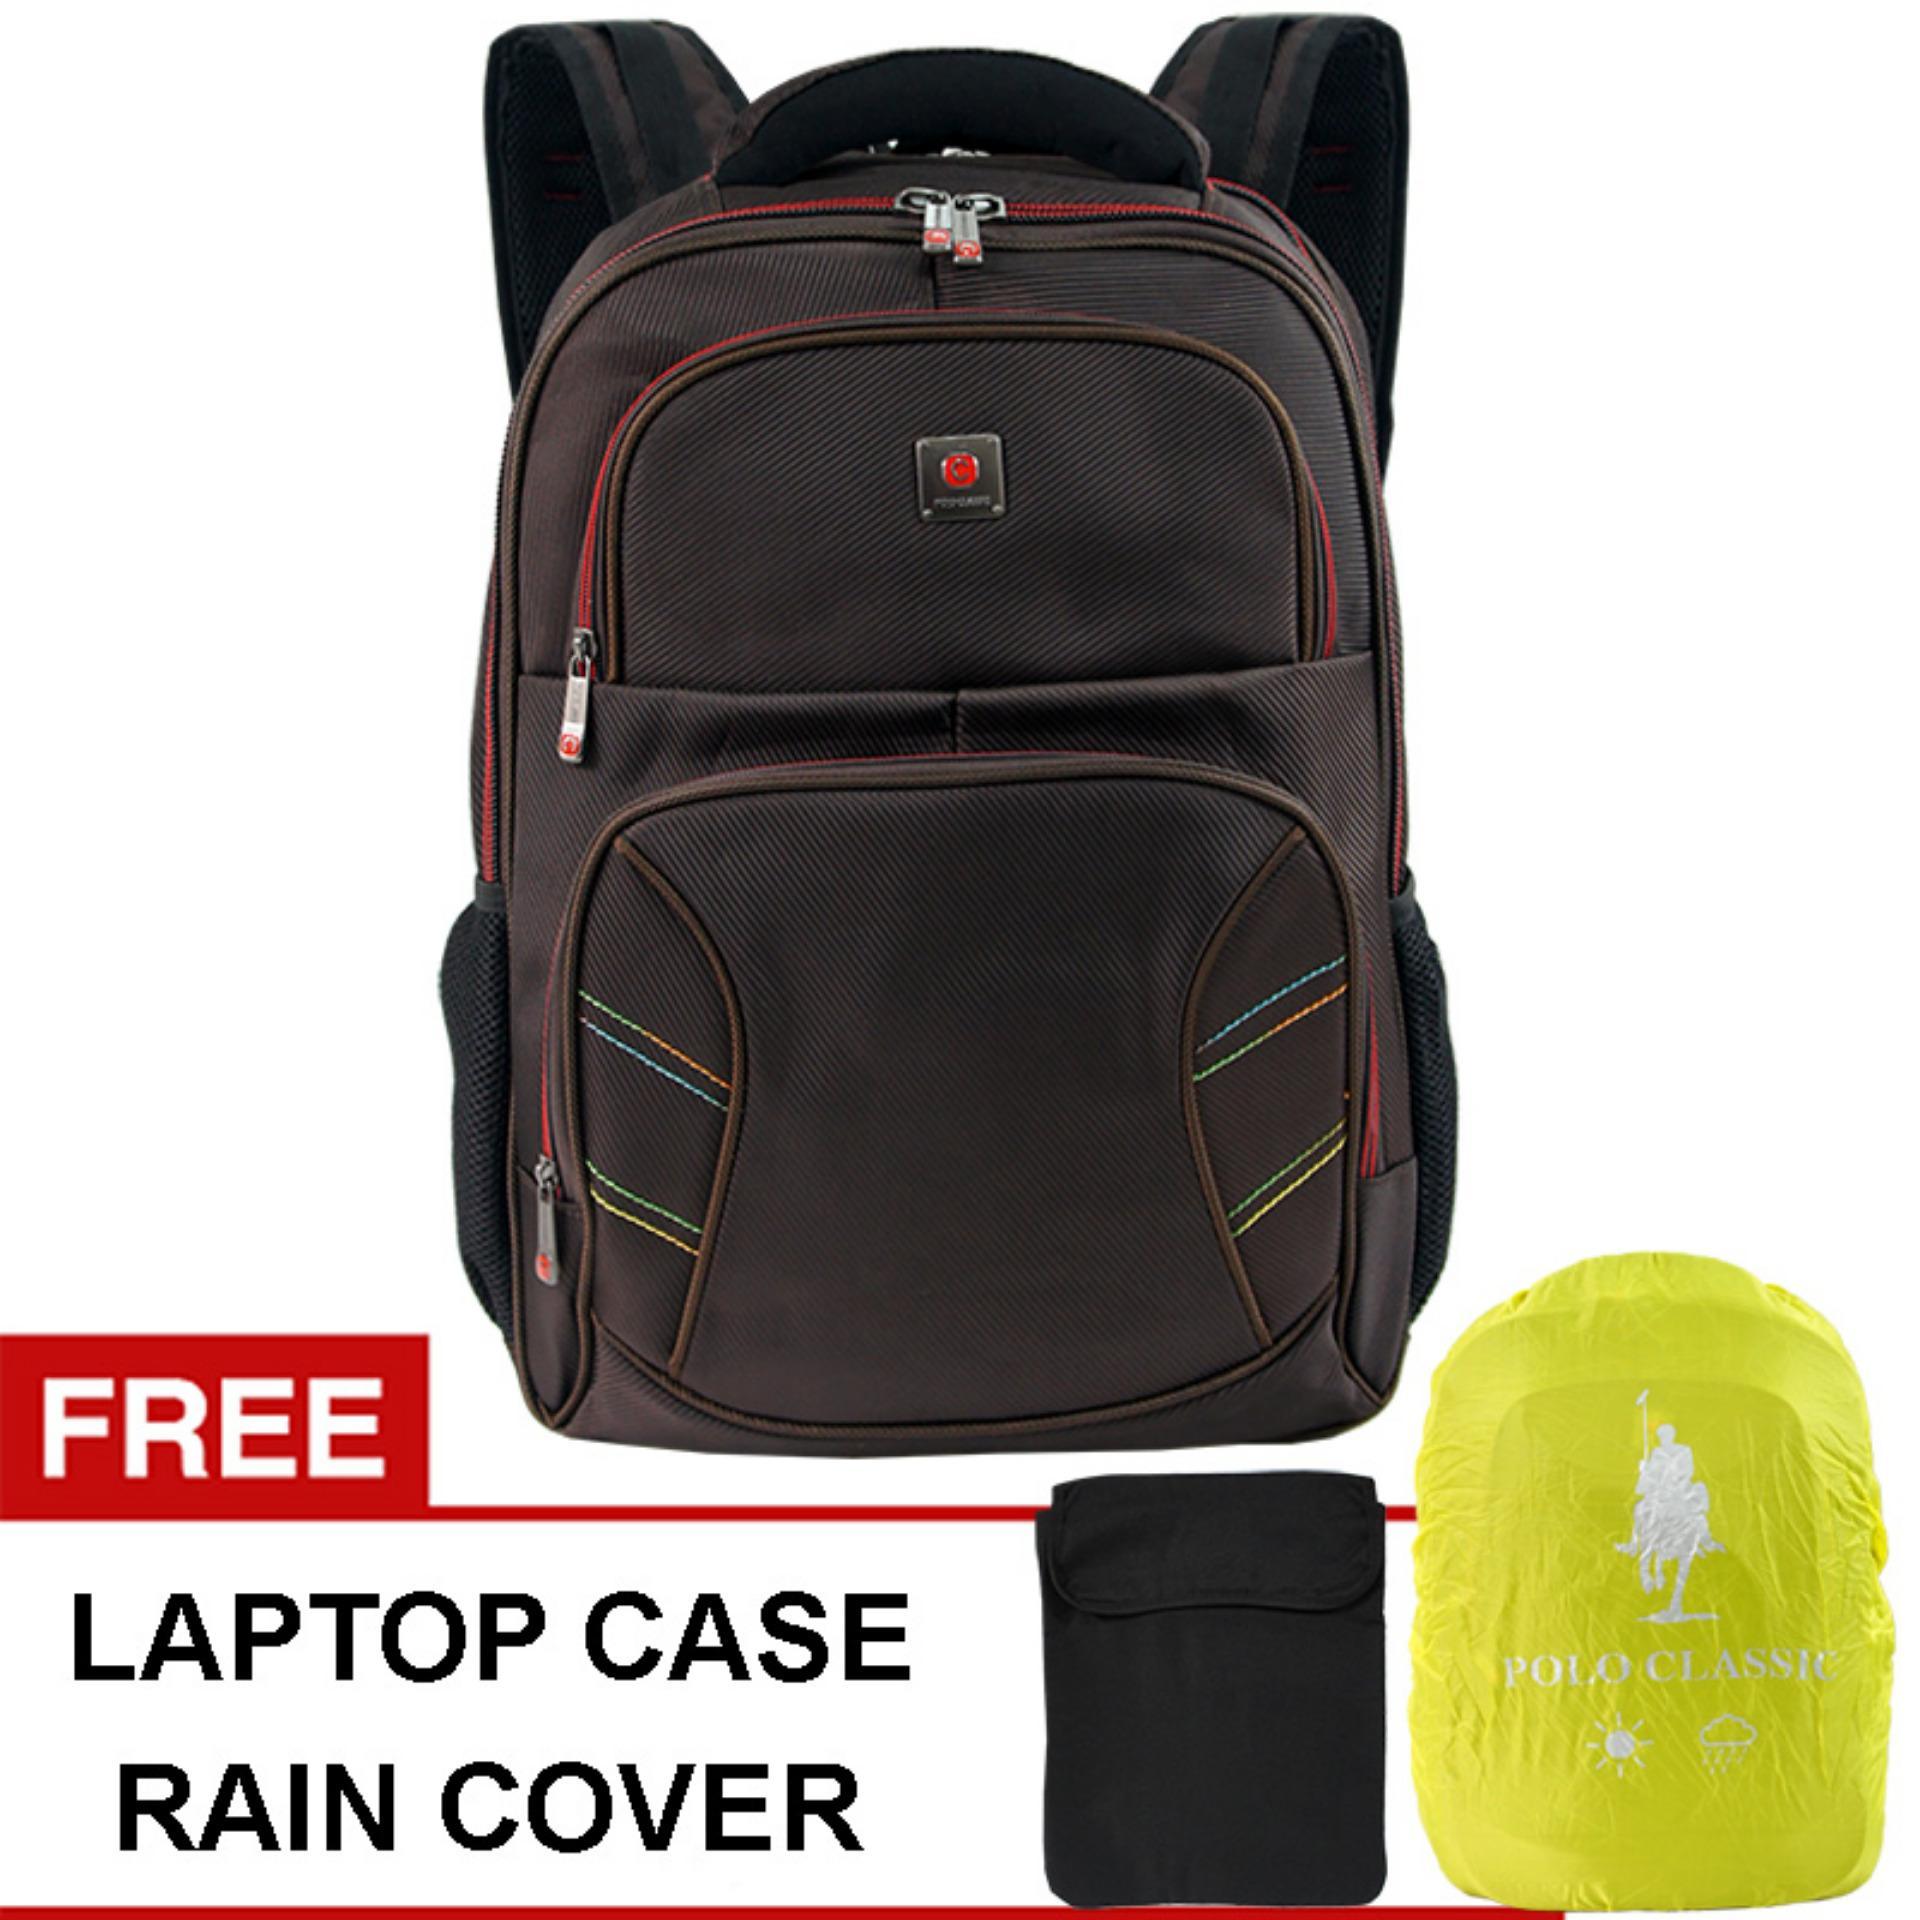 Polo Classic 21 Backpack Rain Cover Coffee Tas Ransel Tas